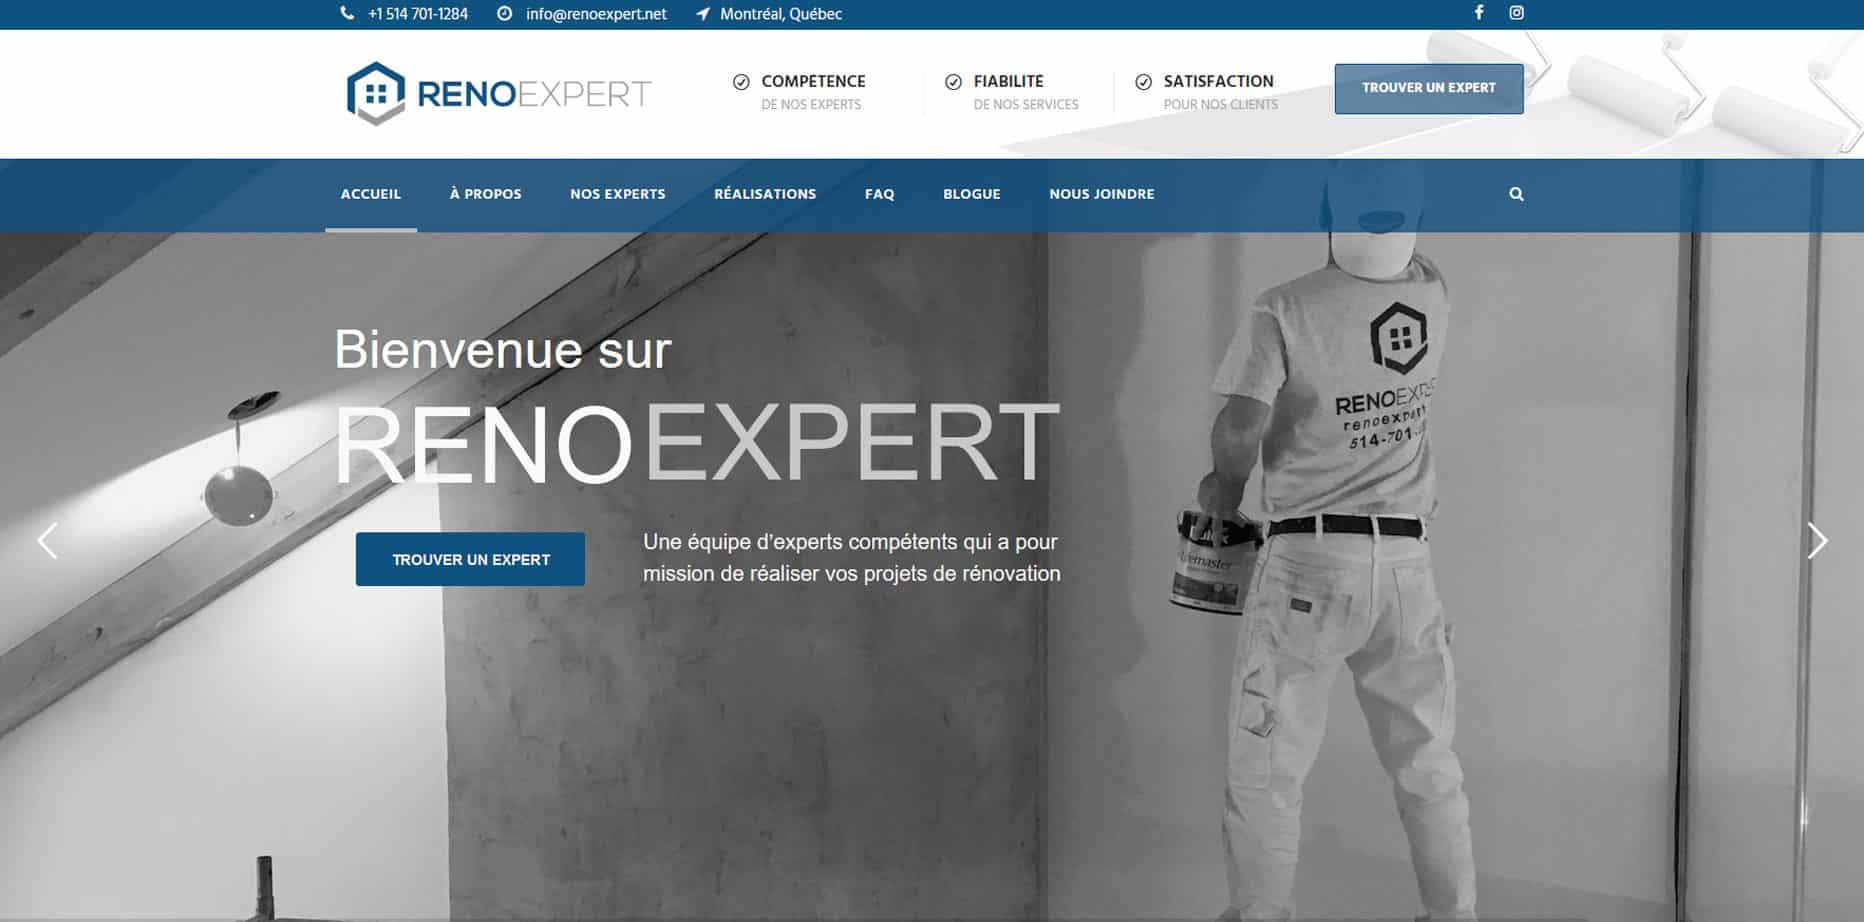 reno-expert-1-7